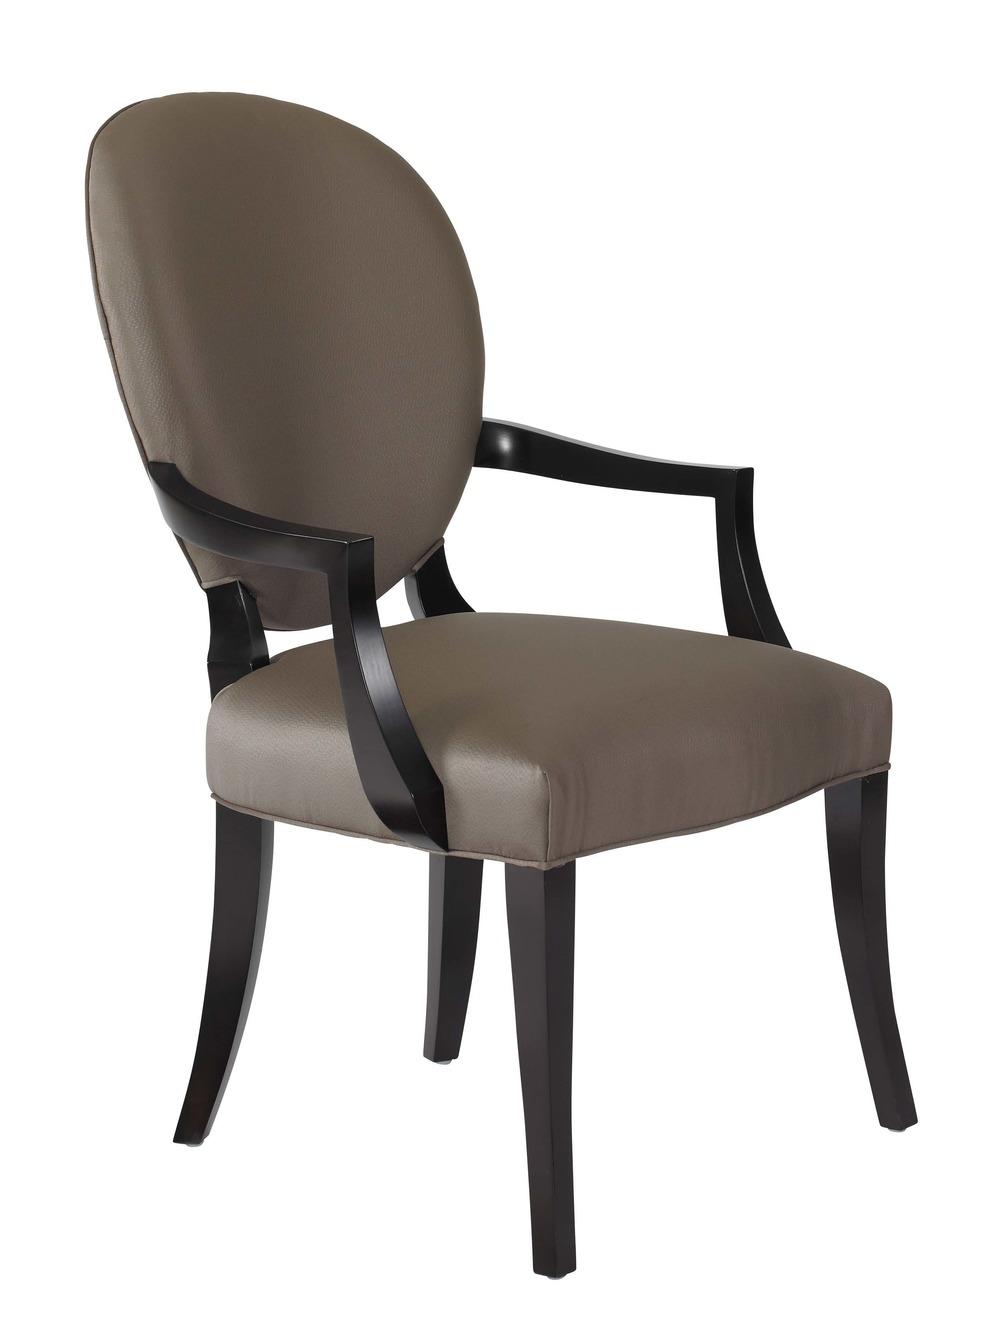 Designmaster Furniture - Amelia Arm Chair